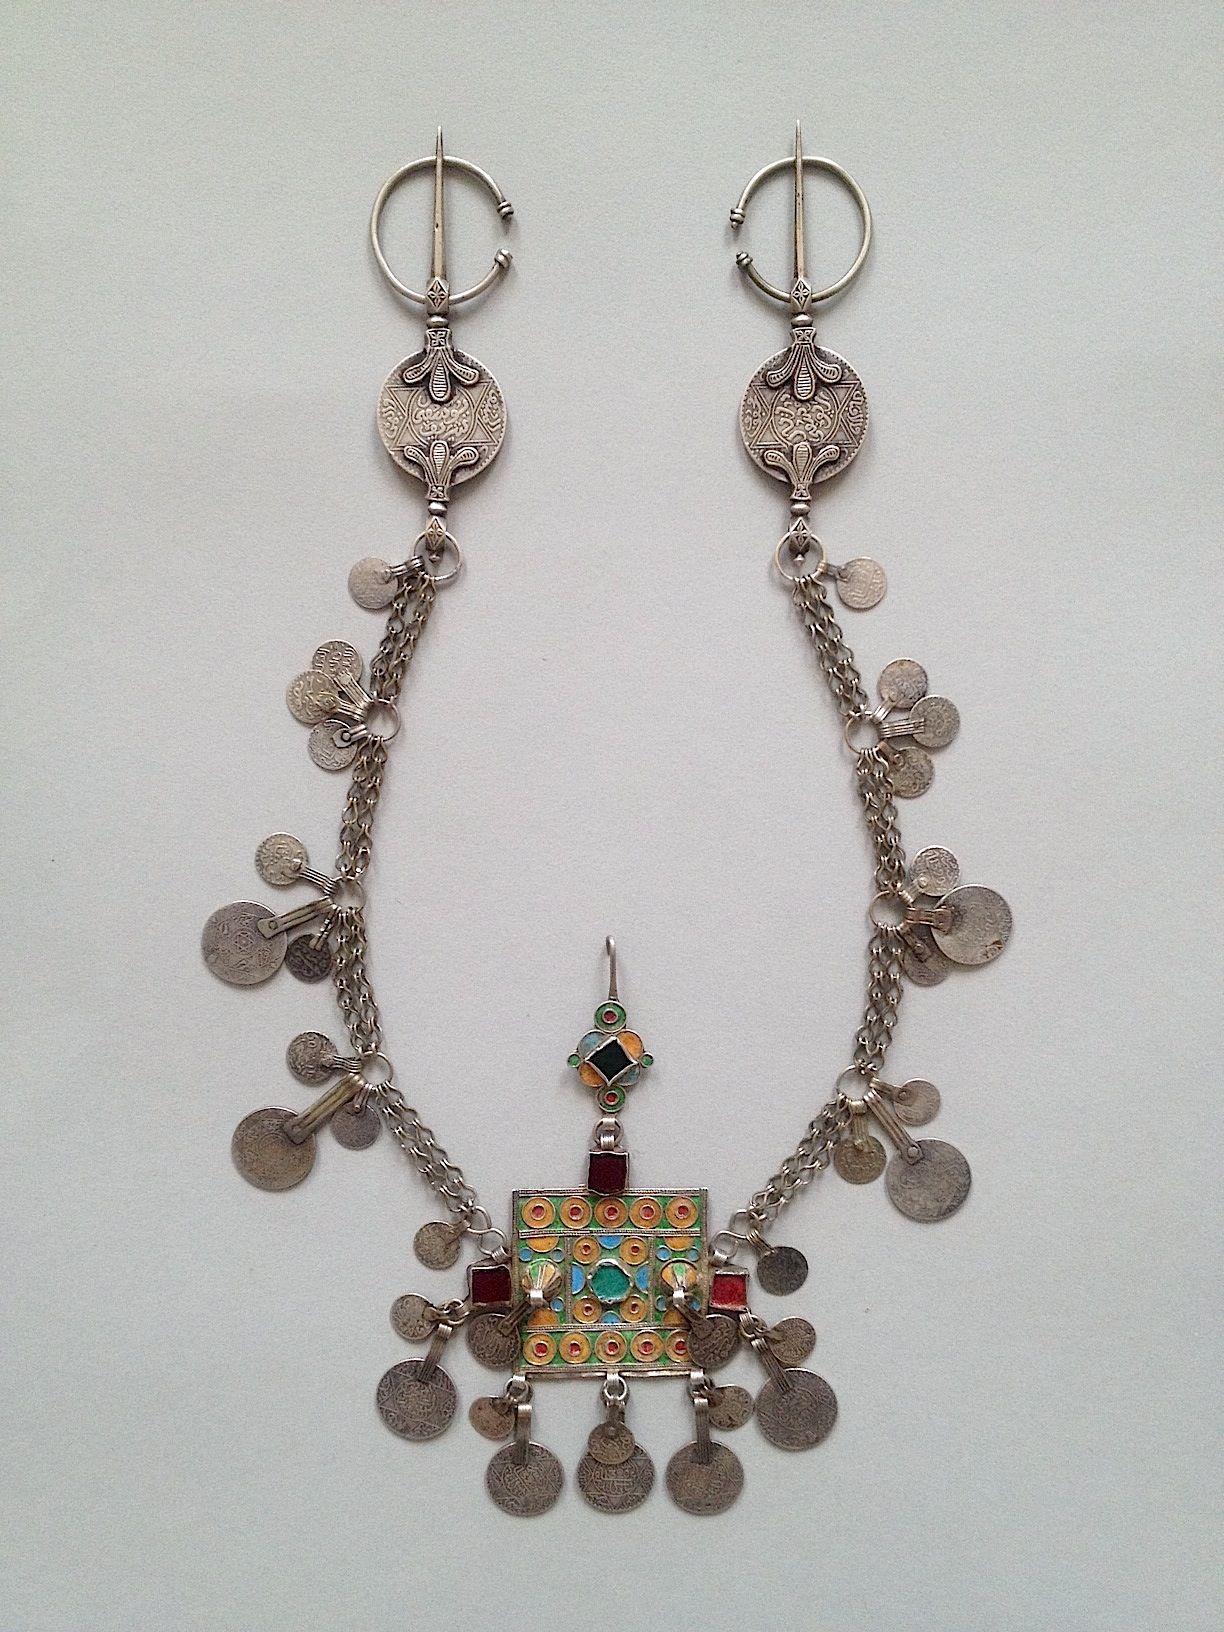 Morocco, Tiznit, Ida Ou Semlal people. Fibulae. Silver, glass and enamel